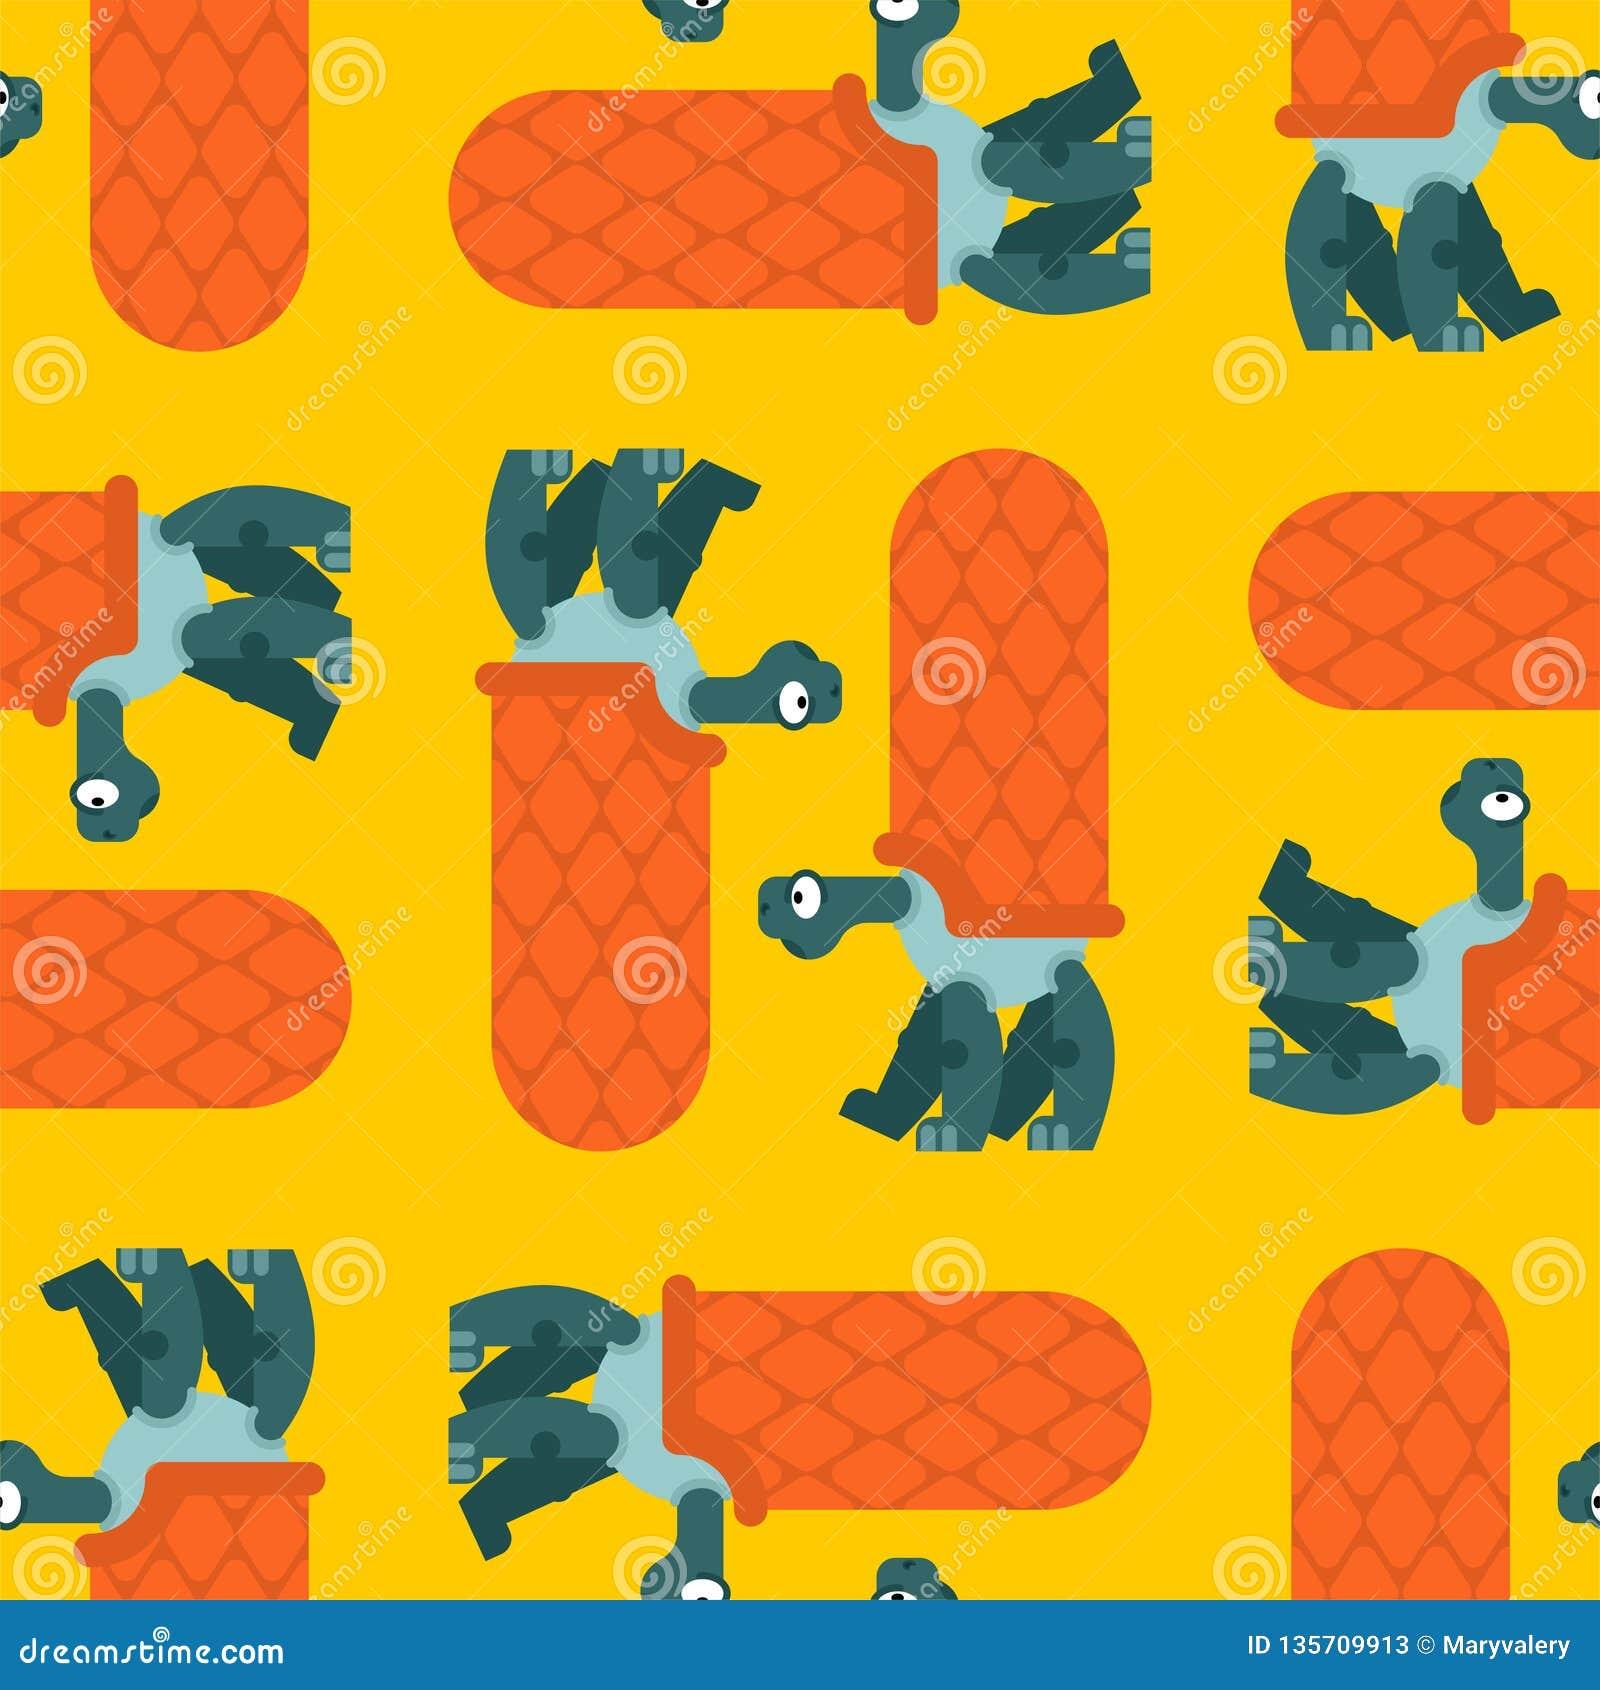 Turtle pattern seamless. Amphibian background. Childrens cloth texture. Animal Ornament